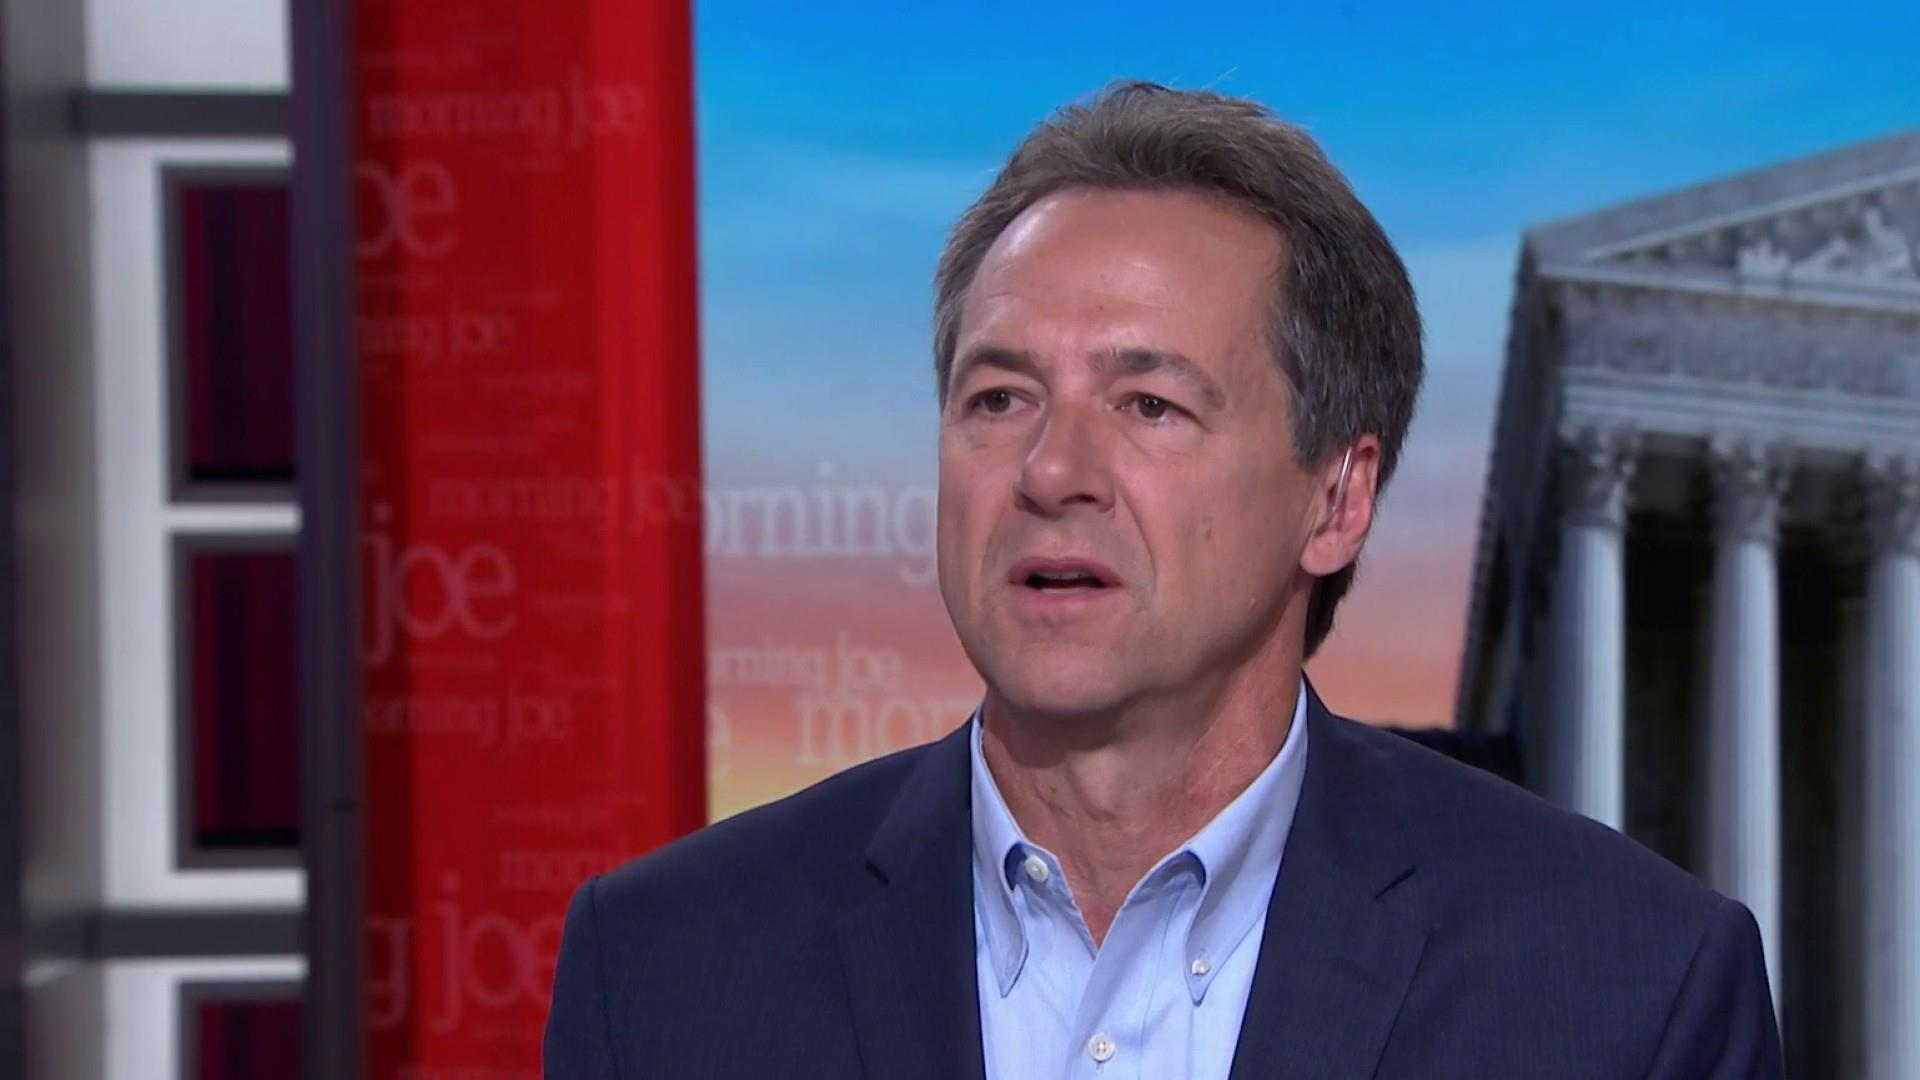 Gov. Bullock preps for debate, takes aim at Iowa